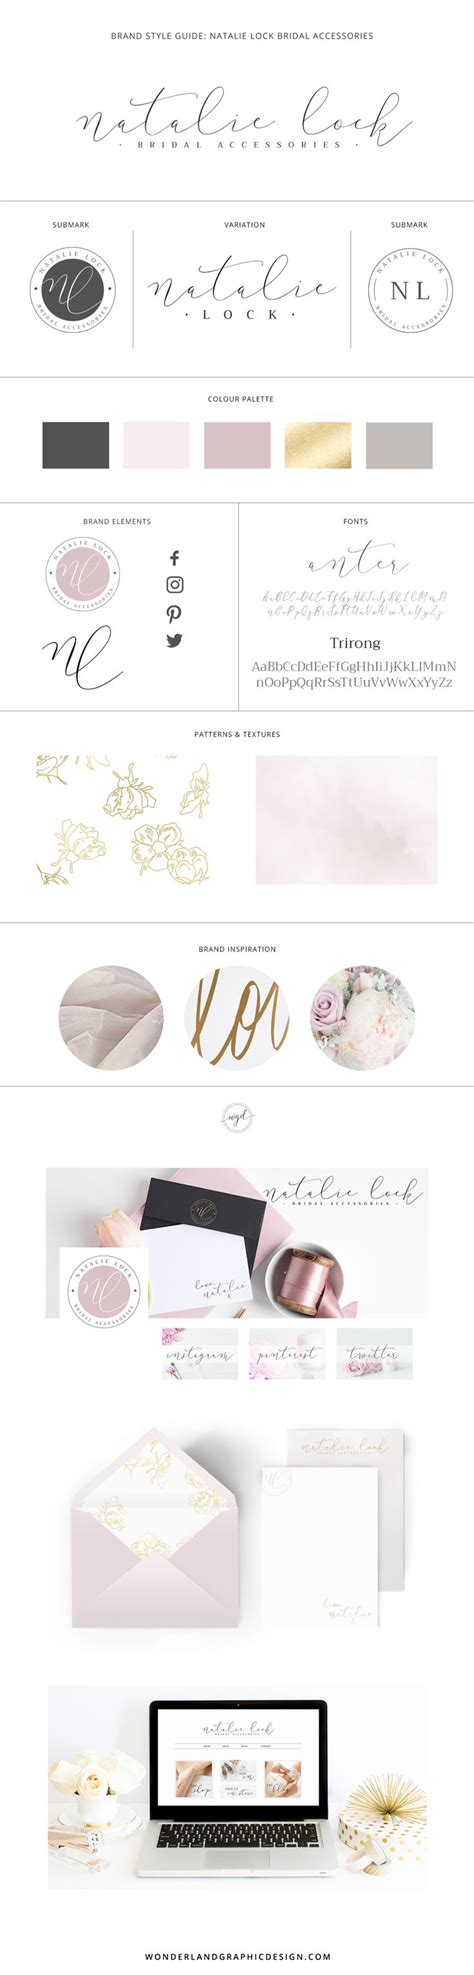 design entrepreneur meaning best 25 business branding ideas only on pinterest color